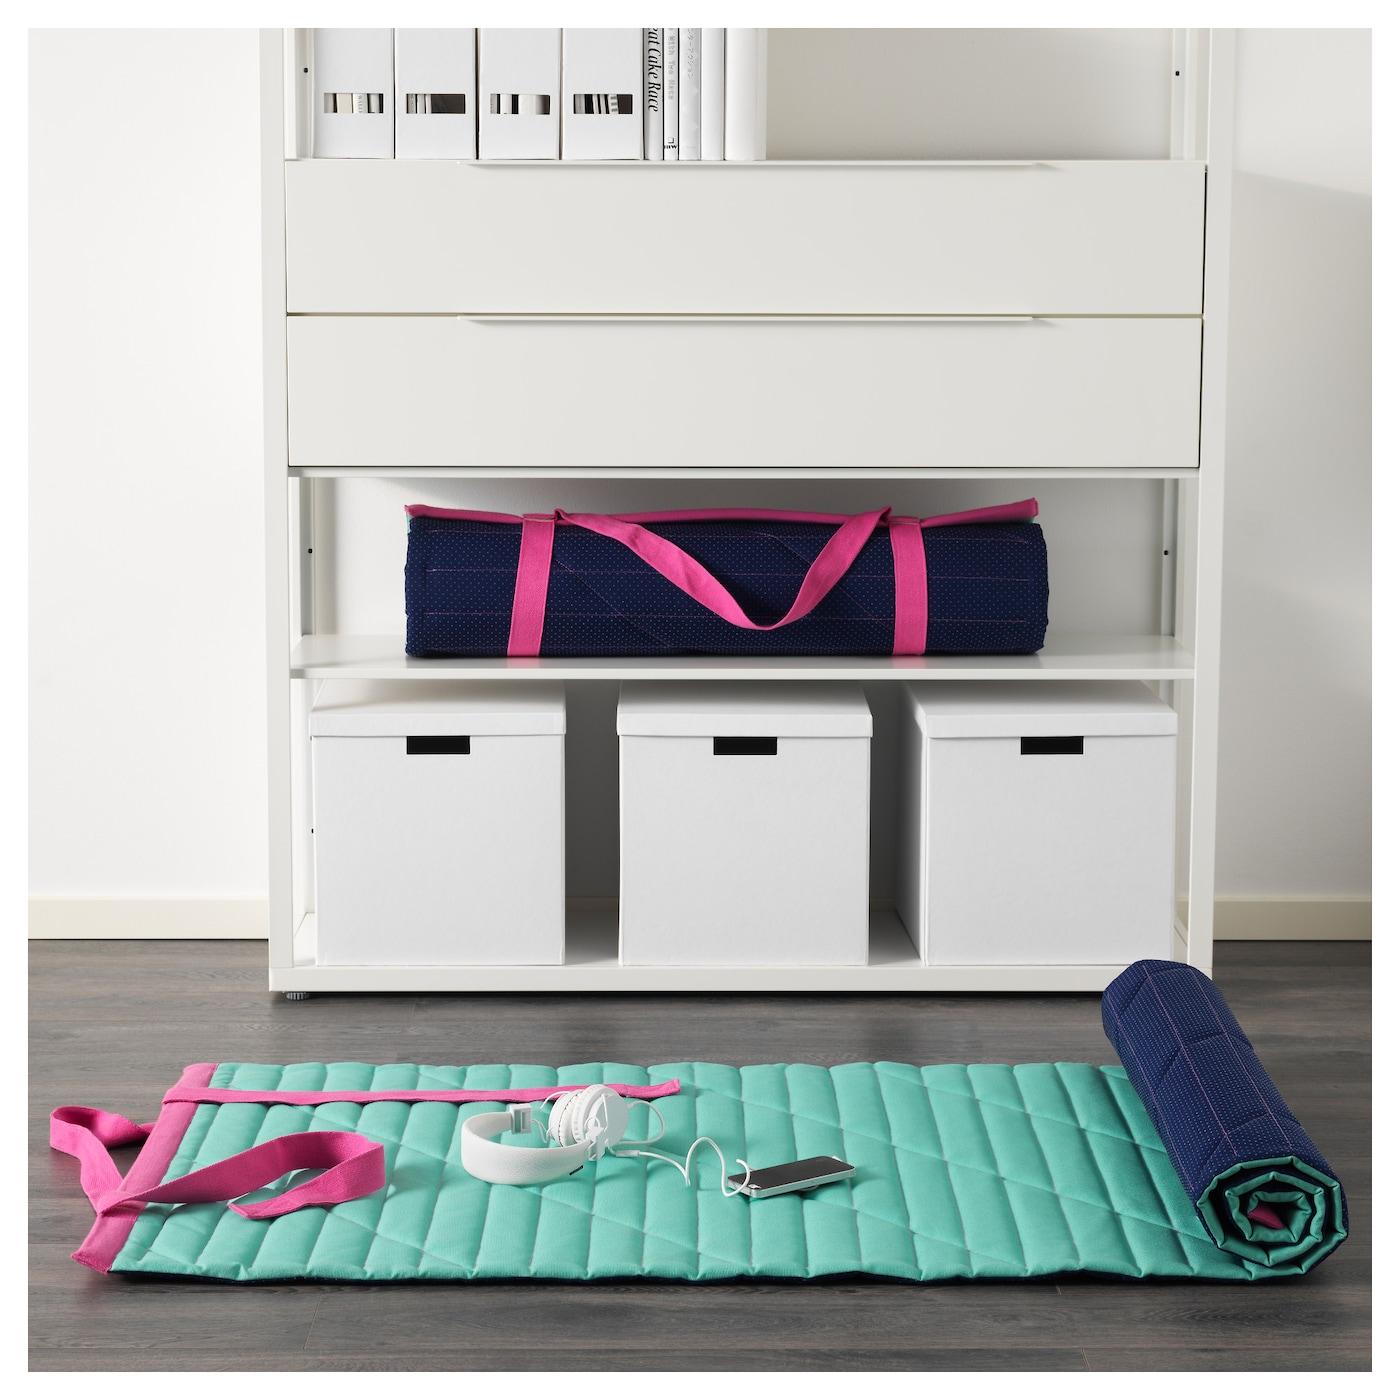 ikea ps 2017 seat floor pad light green 80x200 cm ikea. Black Bedroom Furniture Sets. Home Design Ideas